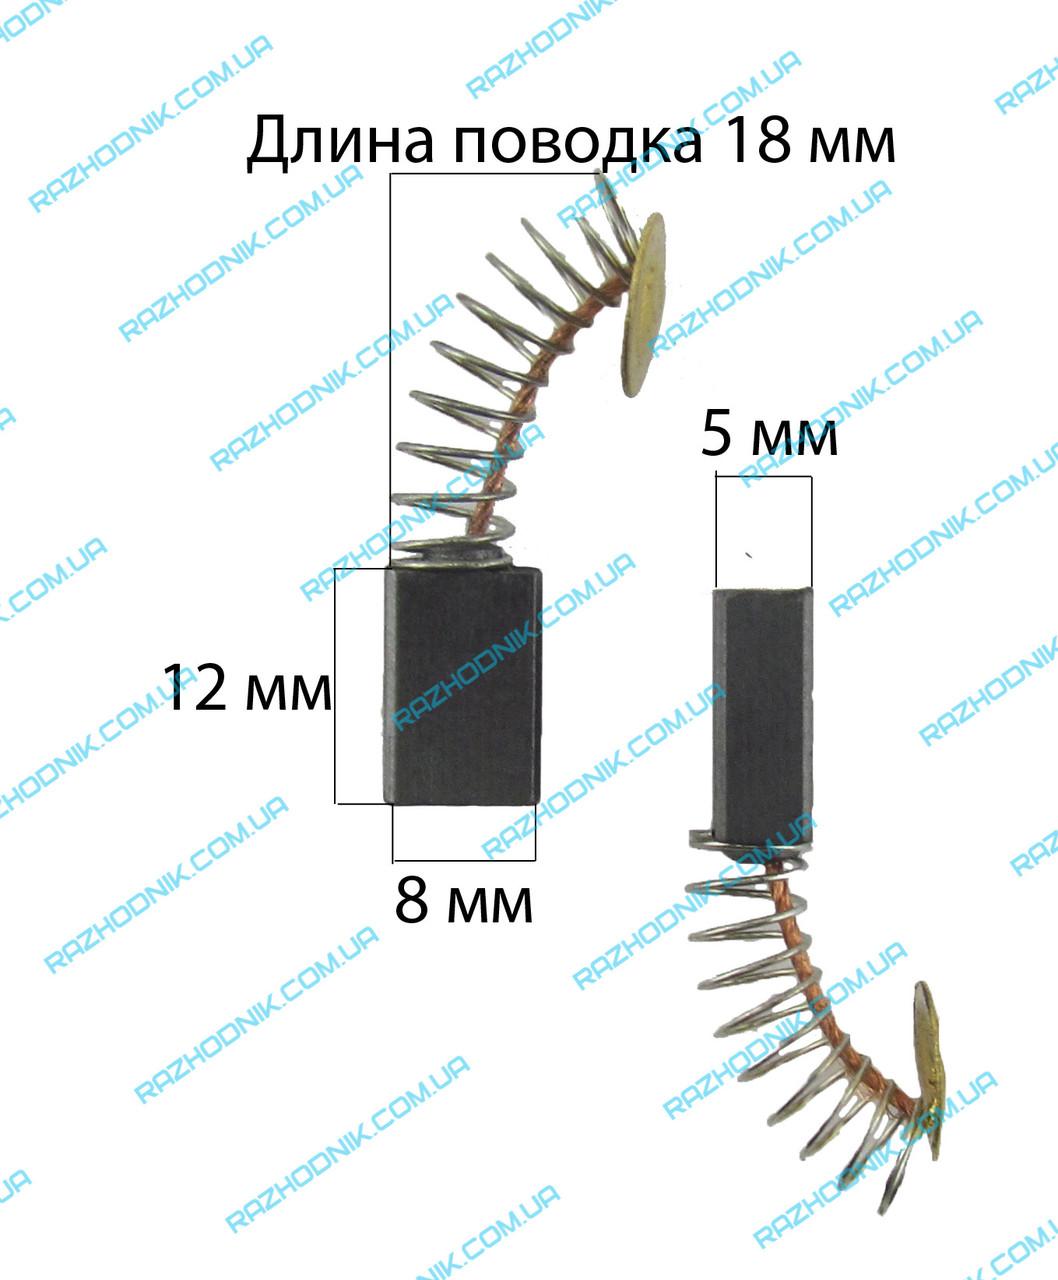 Щетка графитовая для болгарки 5х8х12